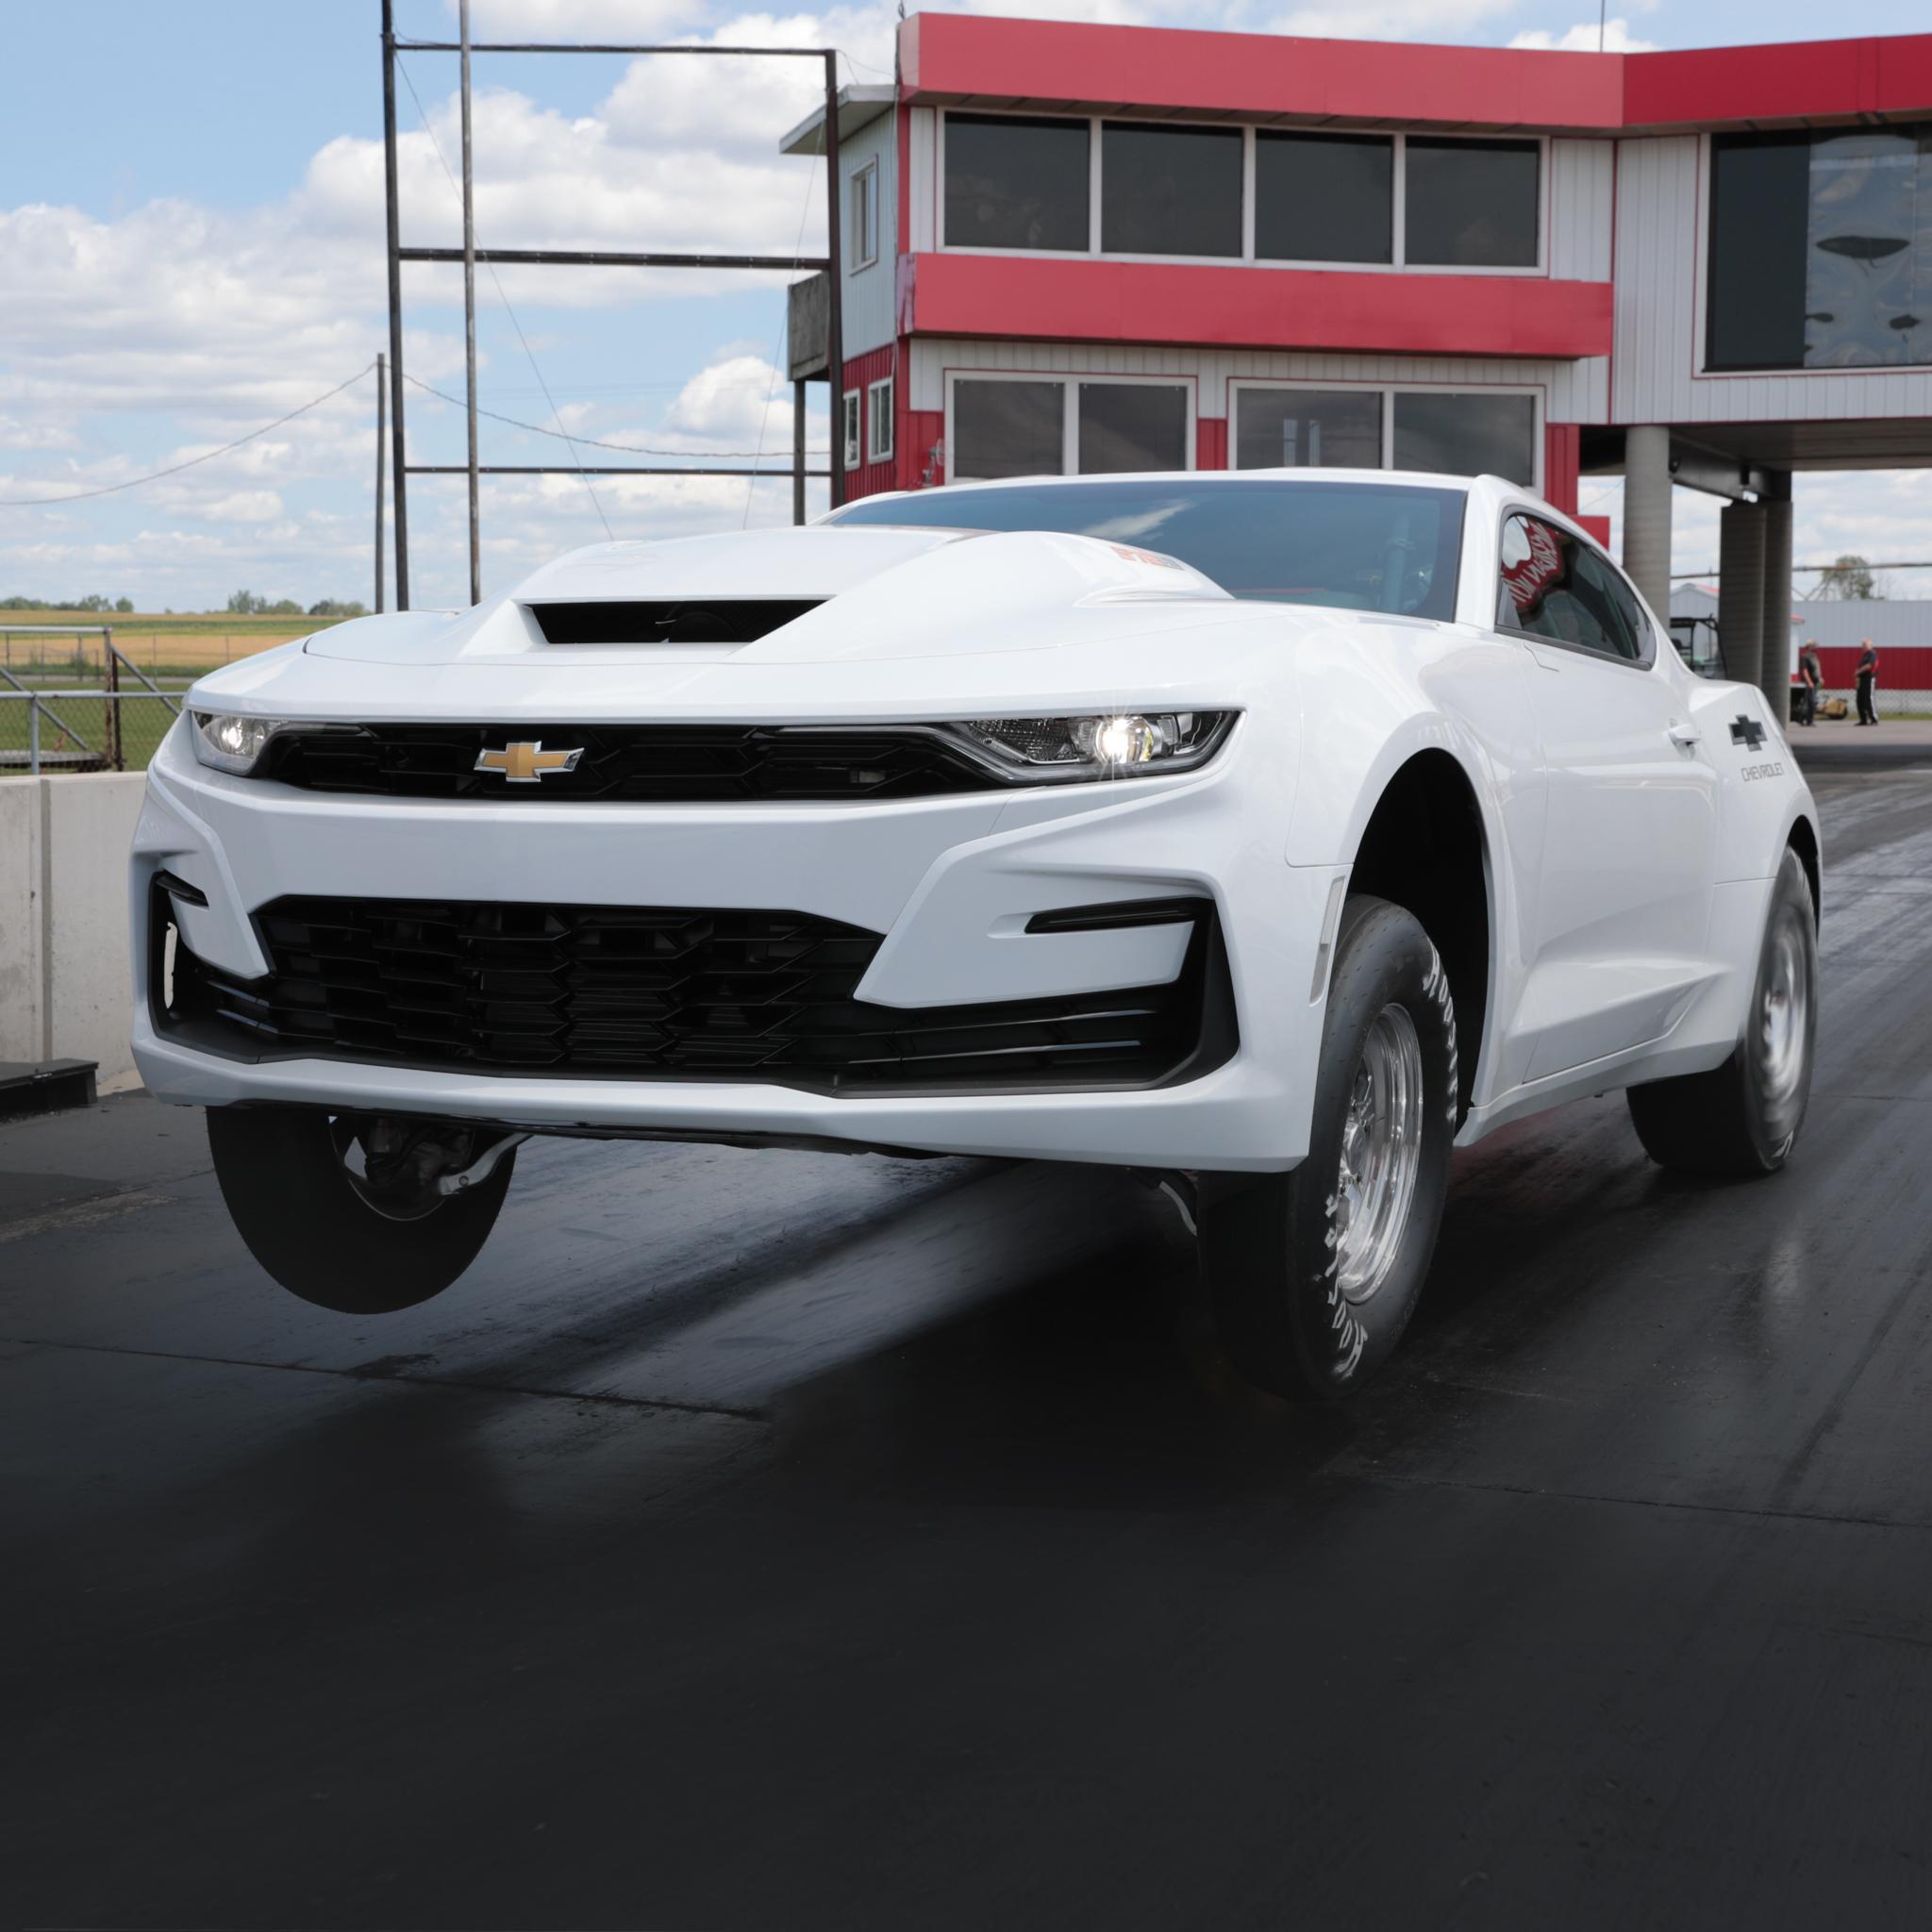 2020 Chevrolet COPO Camaro